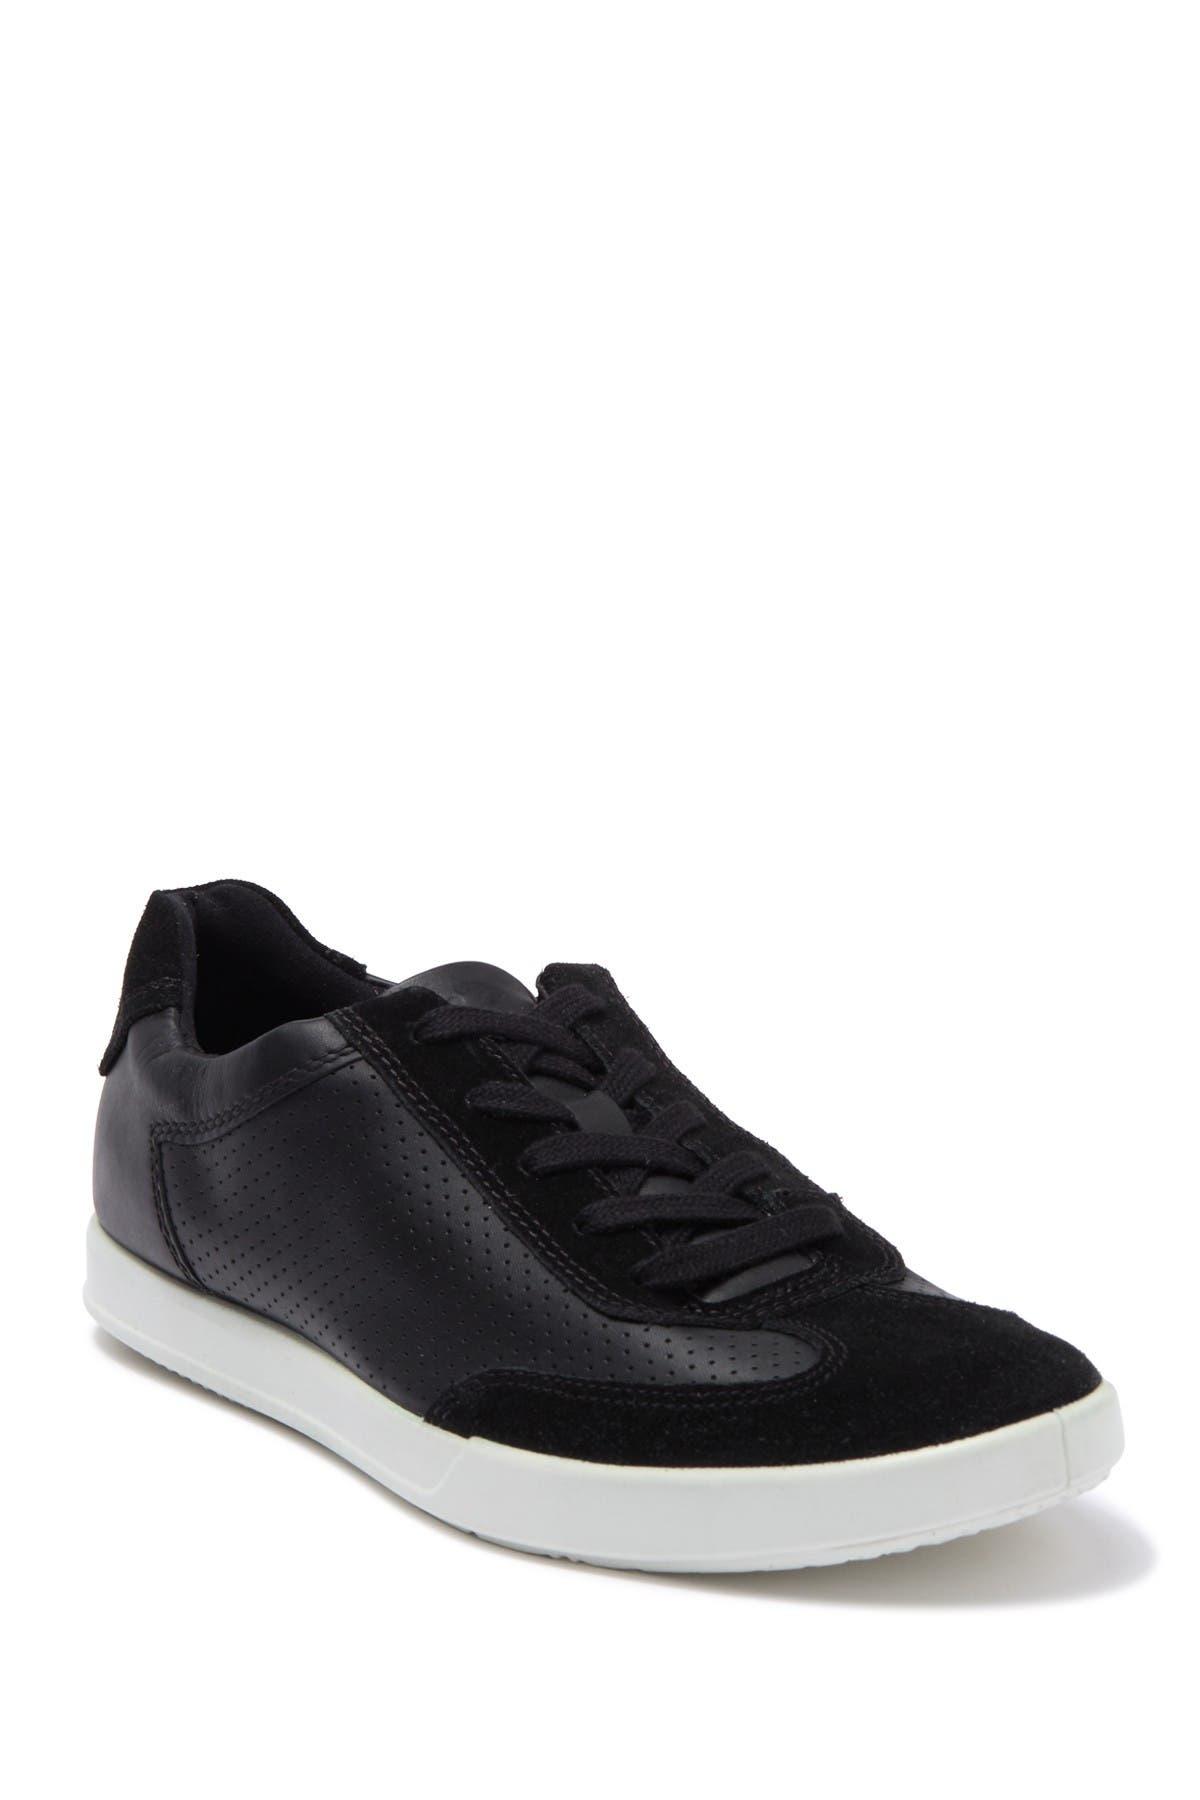 Image of ECCO Cathum Retro Perforated Sneaker